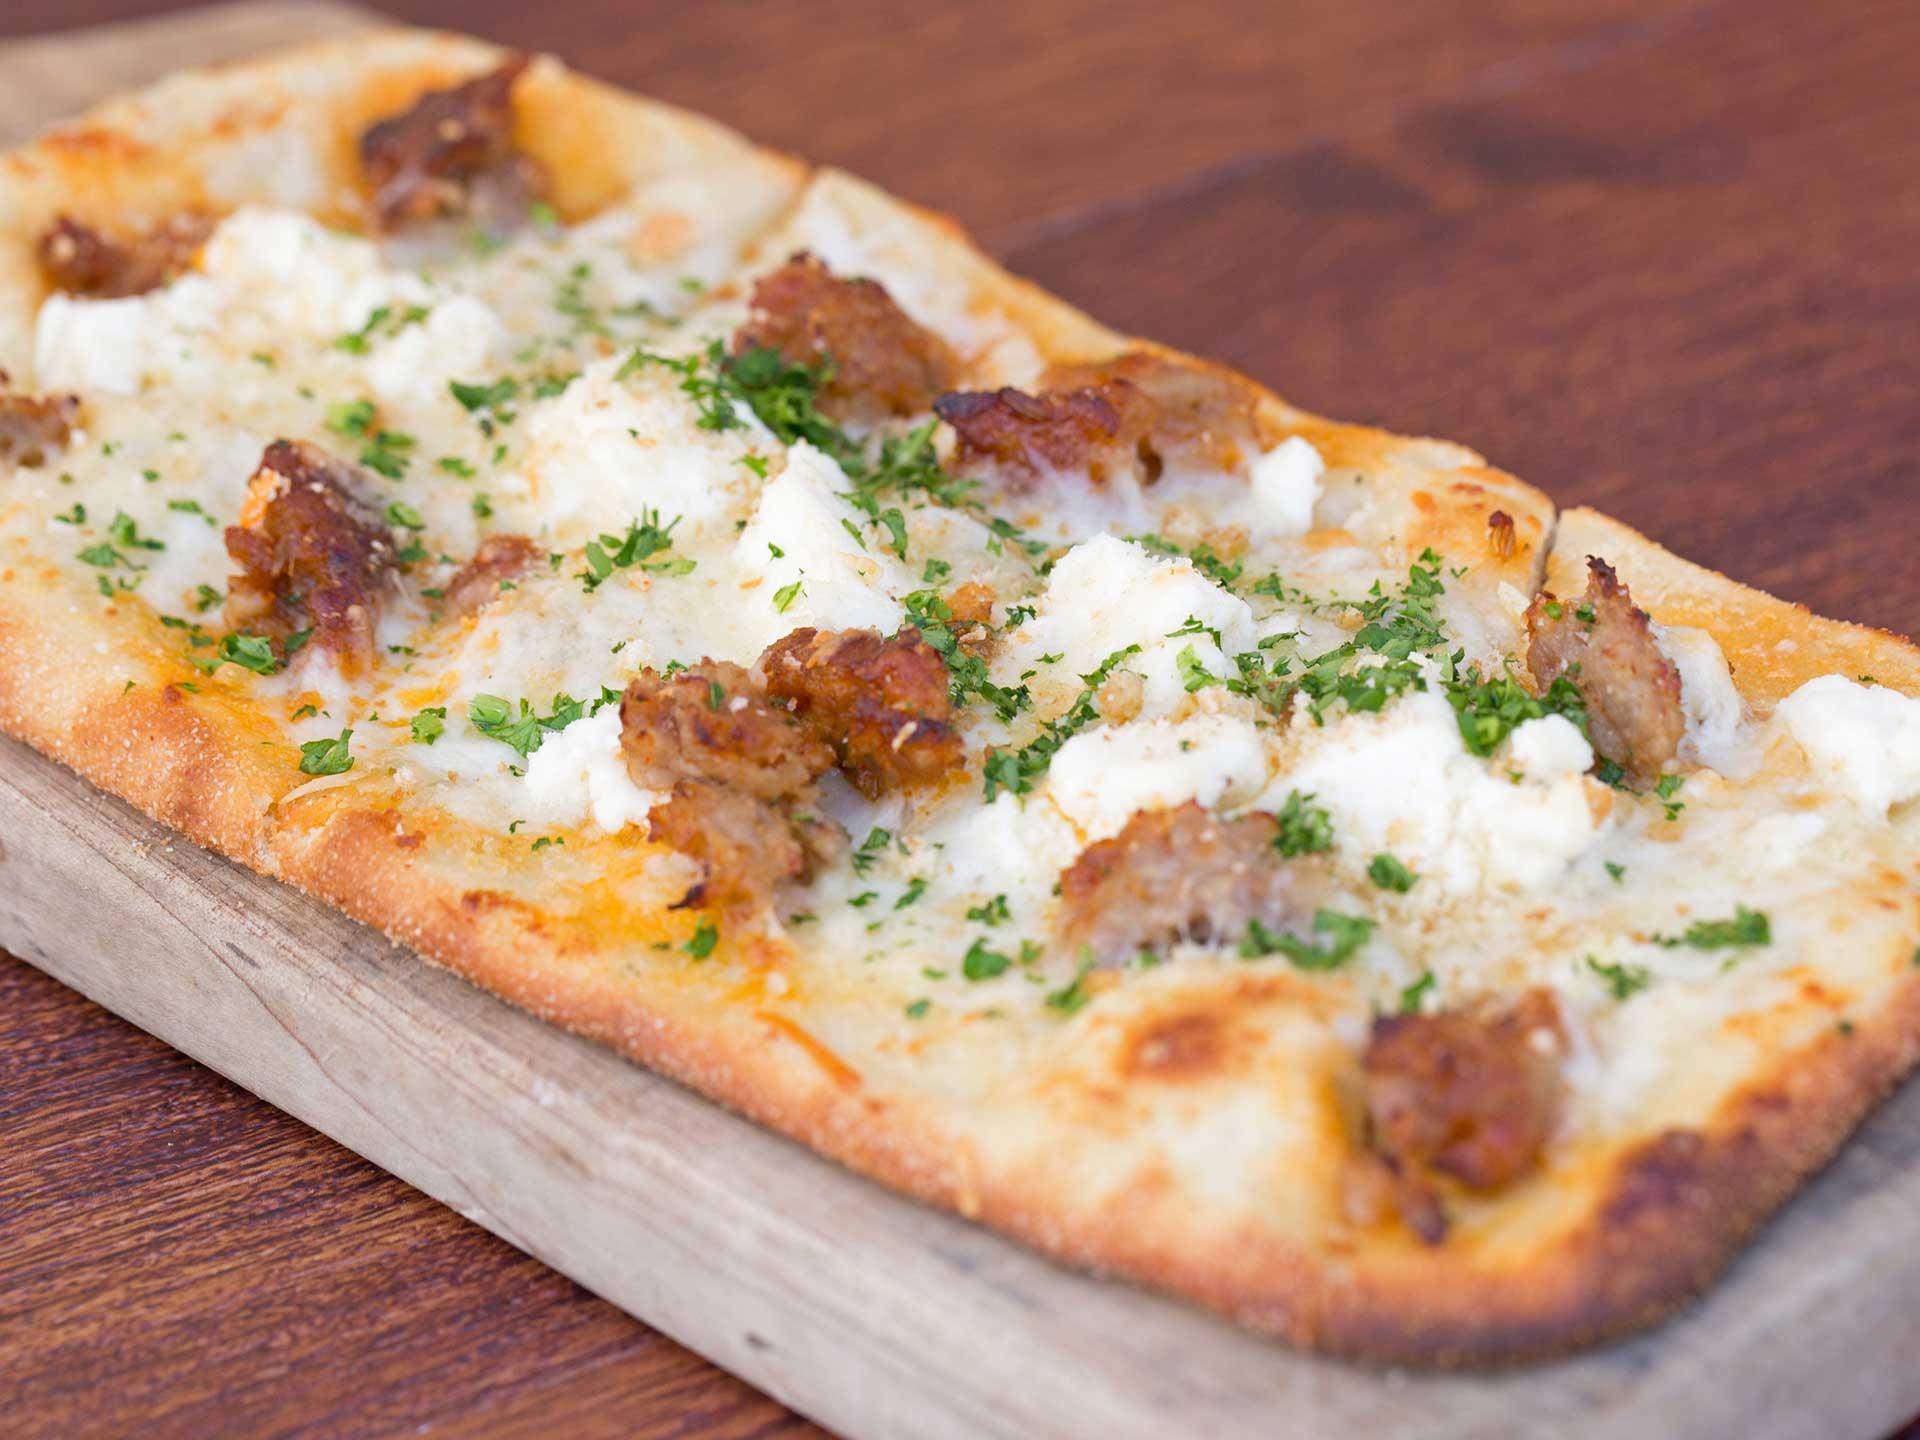 Lettuce Wraps California Pizza Kitchen Calories